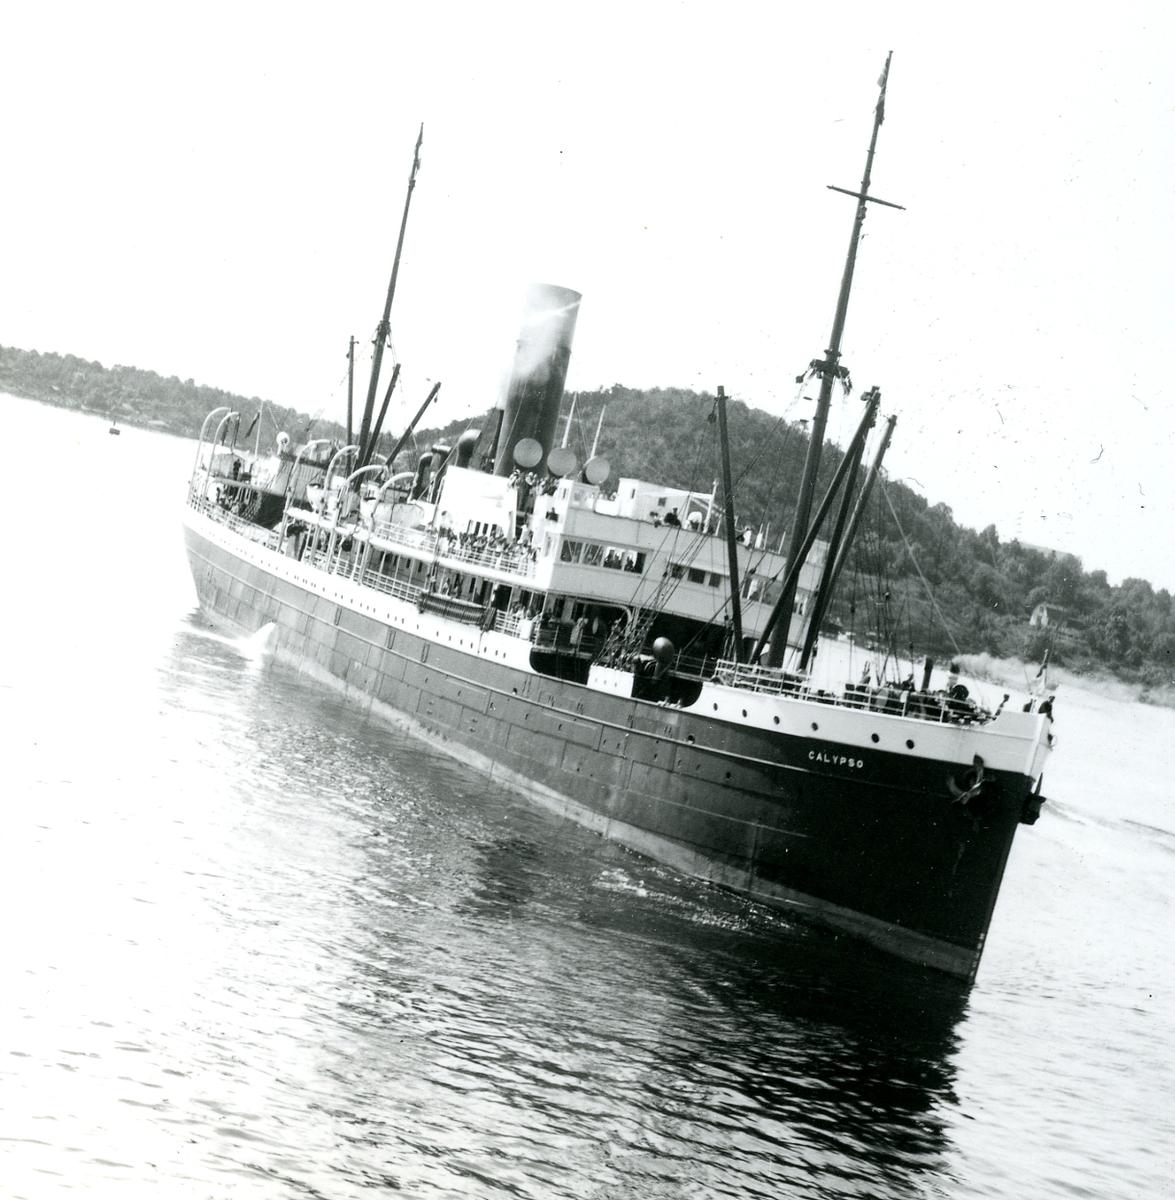 D/S Calypso (Ex. Alexandra Woermann, Bruxellesville)(b.1898, Sir Raylton Dixon & Co. Ltd., Middlesbrough)